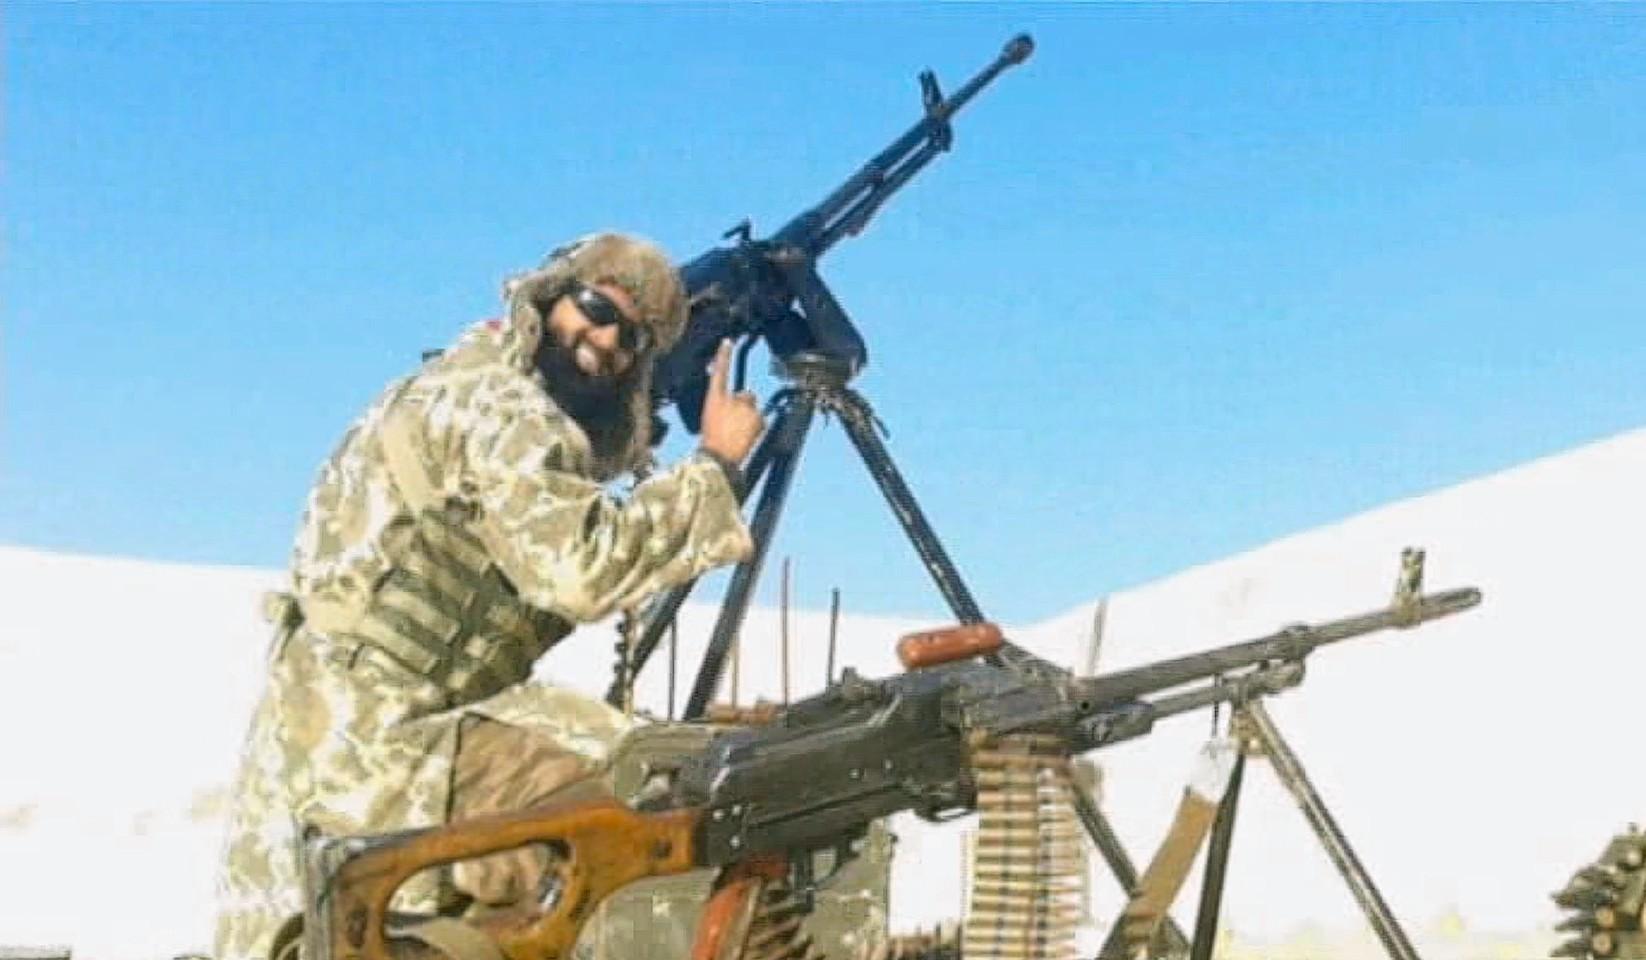 Aberdeen jihadist in ISIS recruitment video, Abdul Rakib Amin